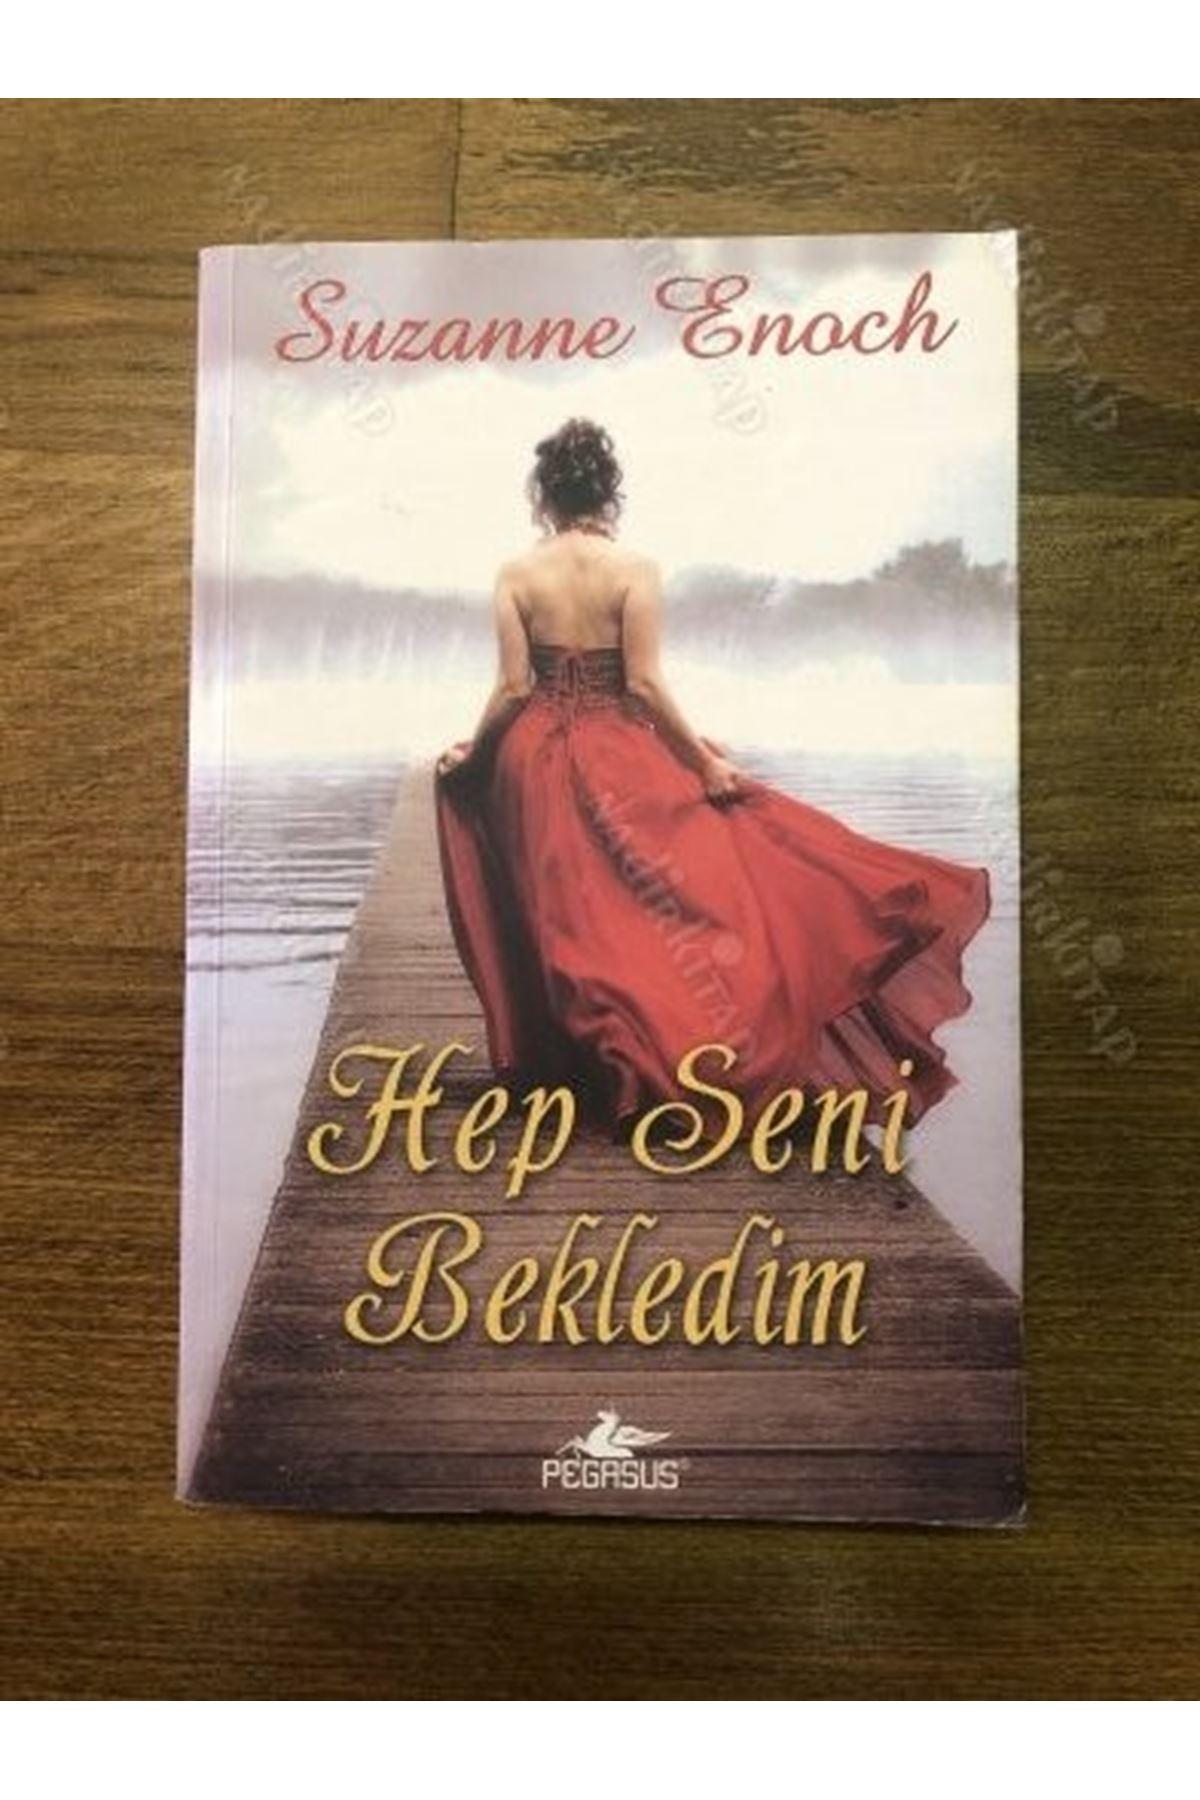 SUZANNE ENOCH - HEP SENİ BEKLEDİM